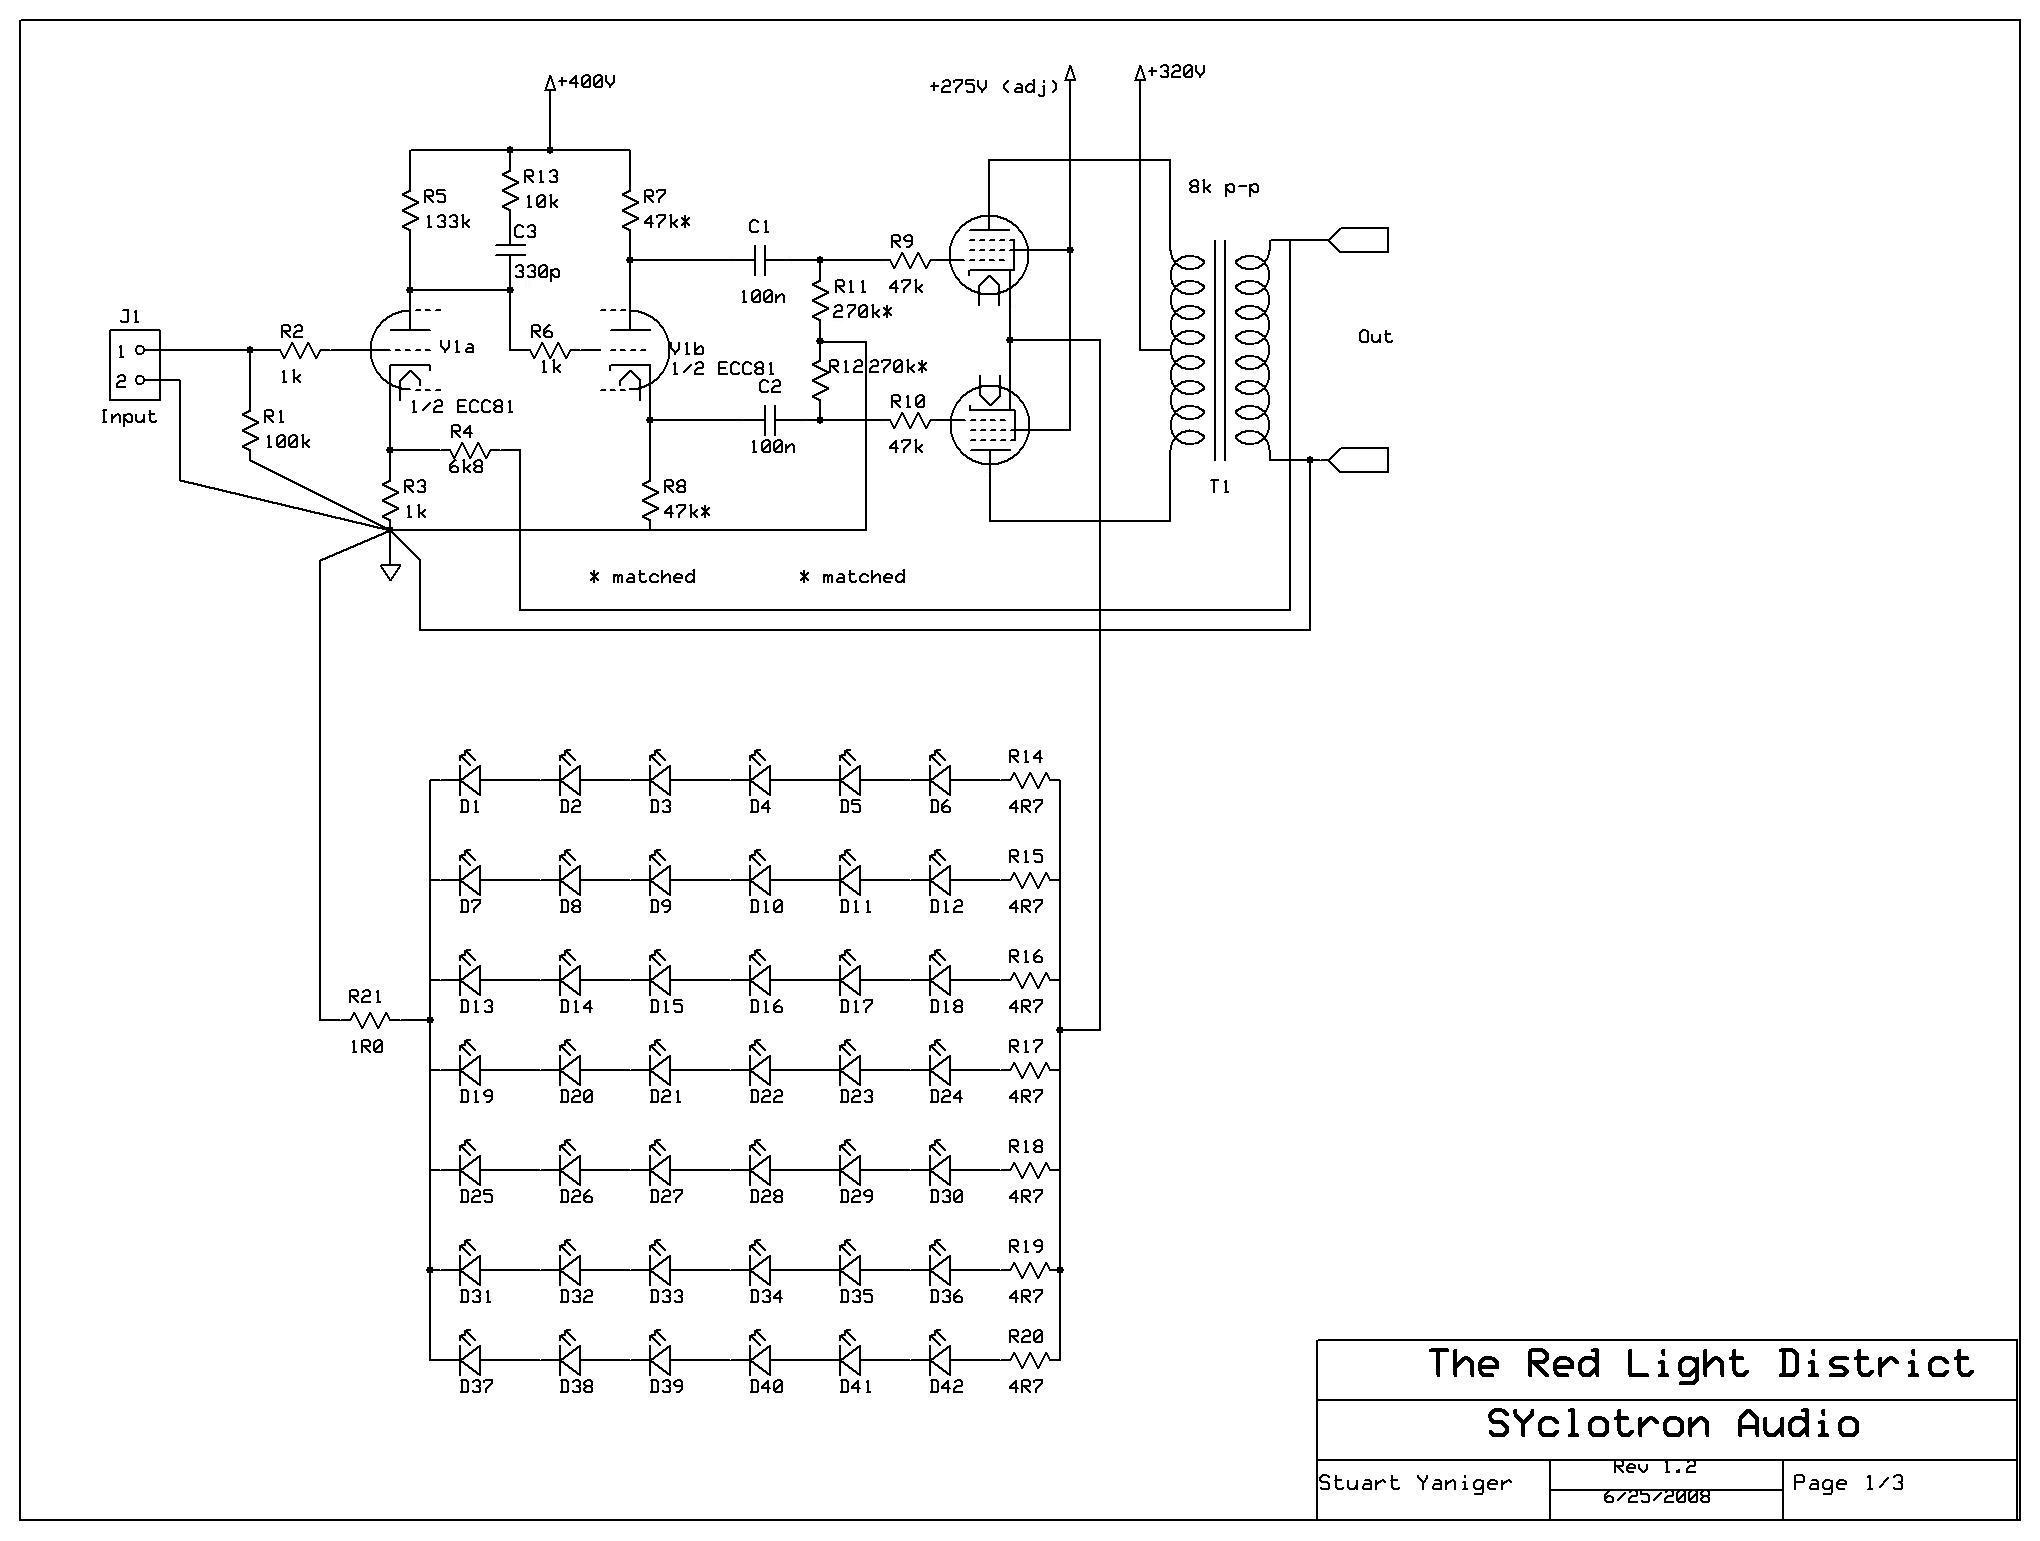 rld_signal_circuit.jpg?phpMyAdmin=CayBDF